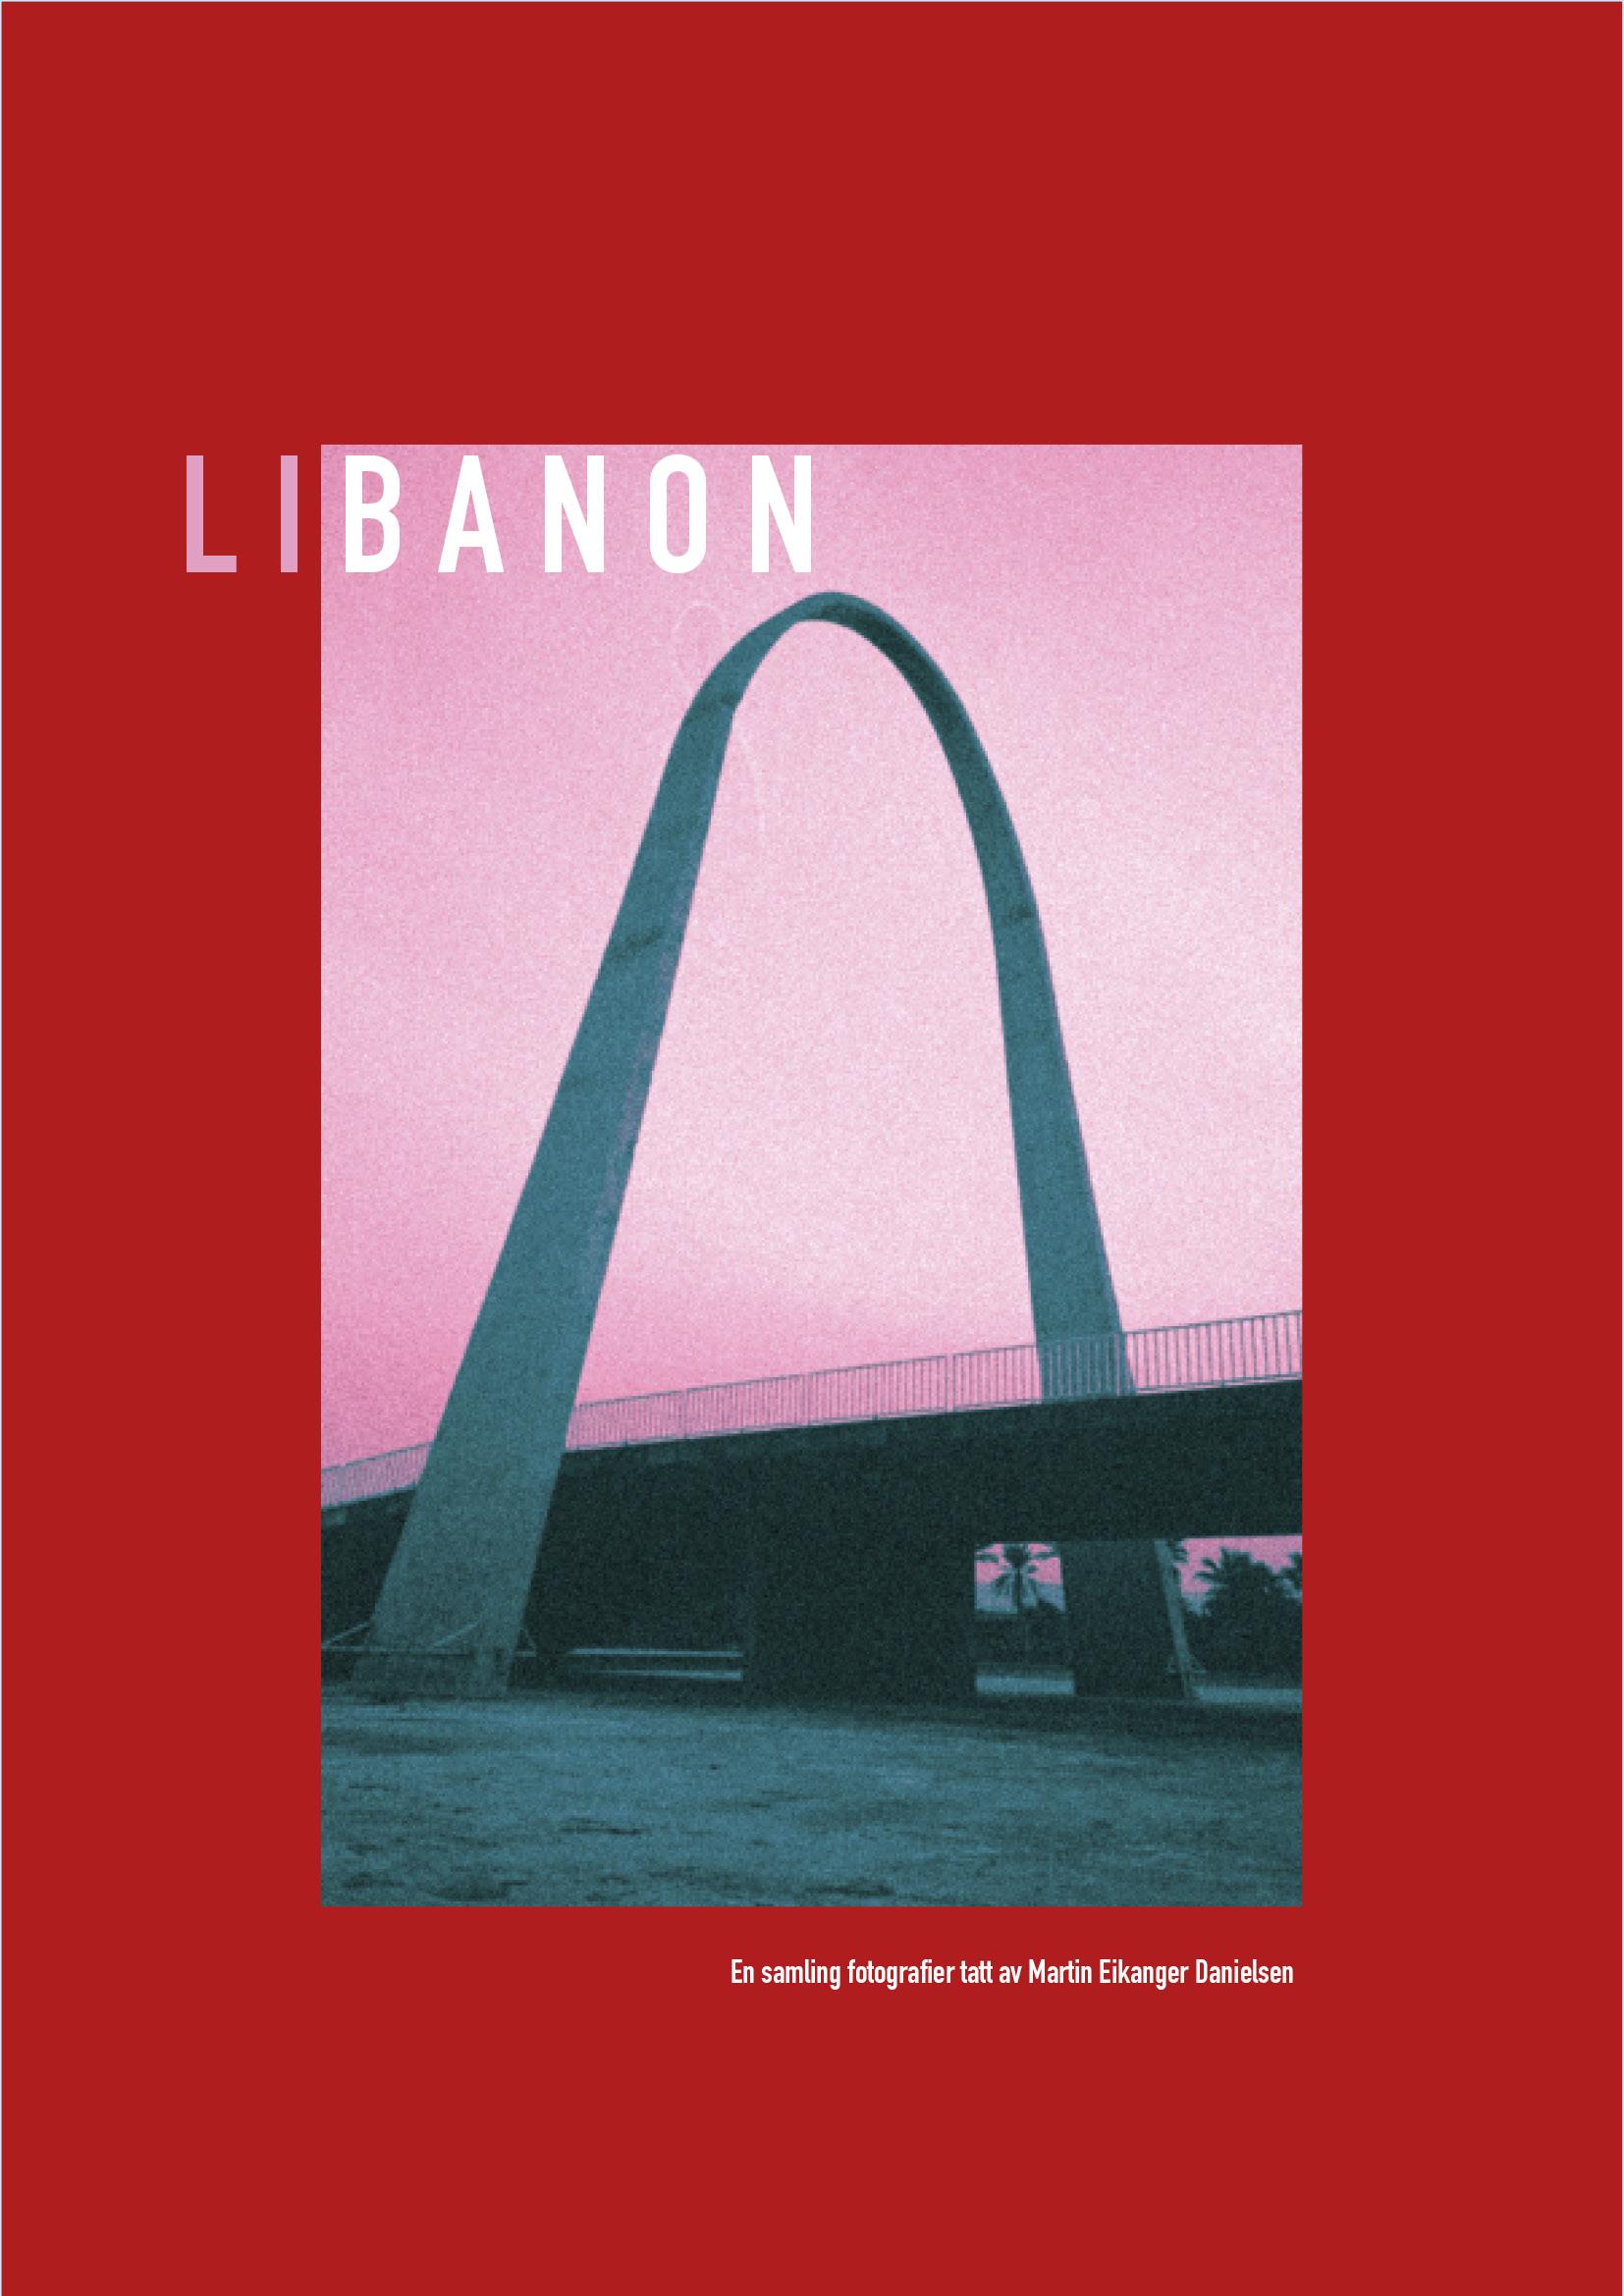 libanonzineprint-SIDE.jpg